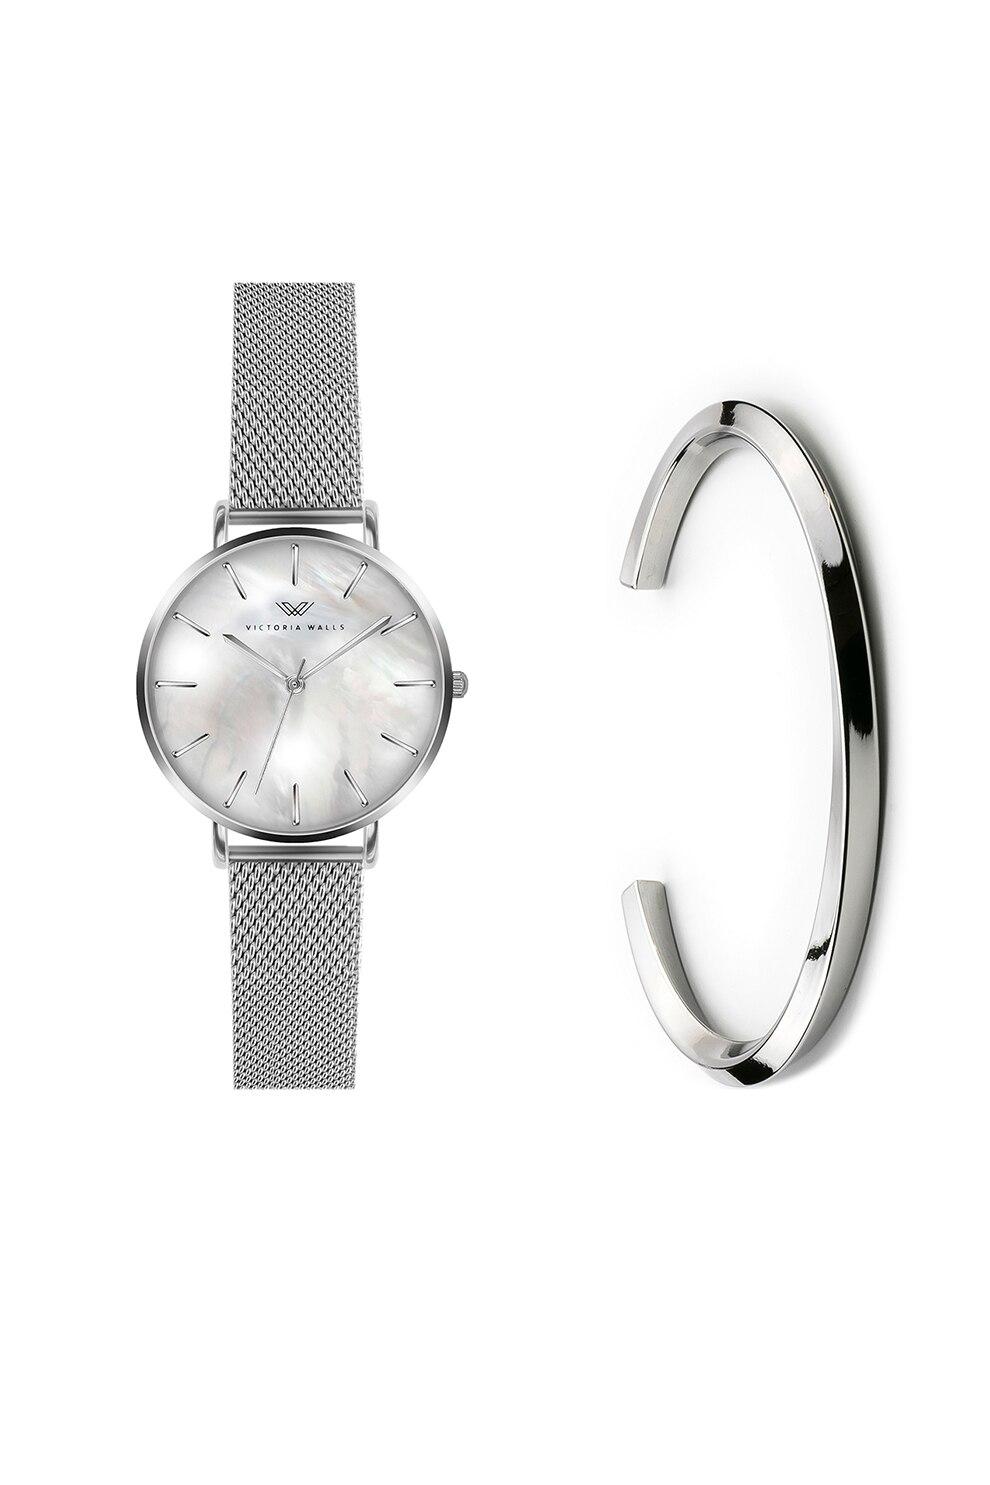 Fotografie Victoria Walls, Set de ceas de otel inoxidabil si bratara, Argintiu